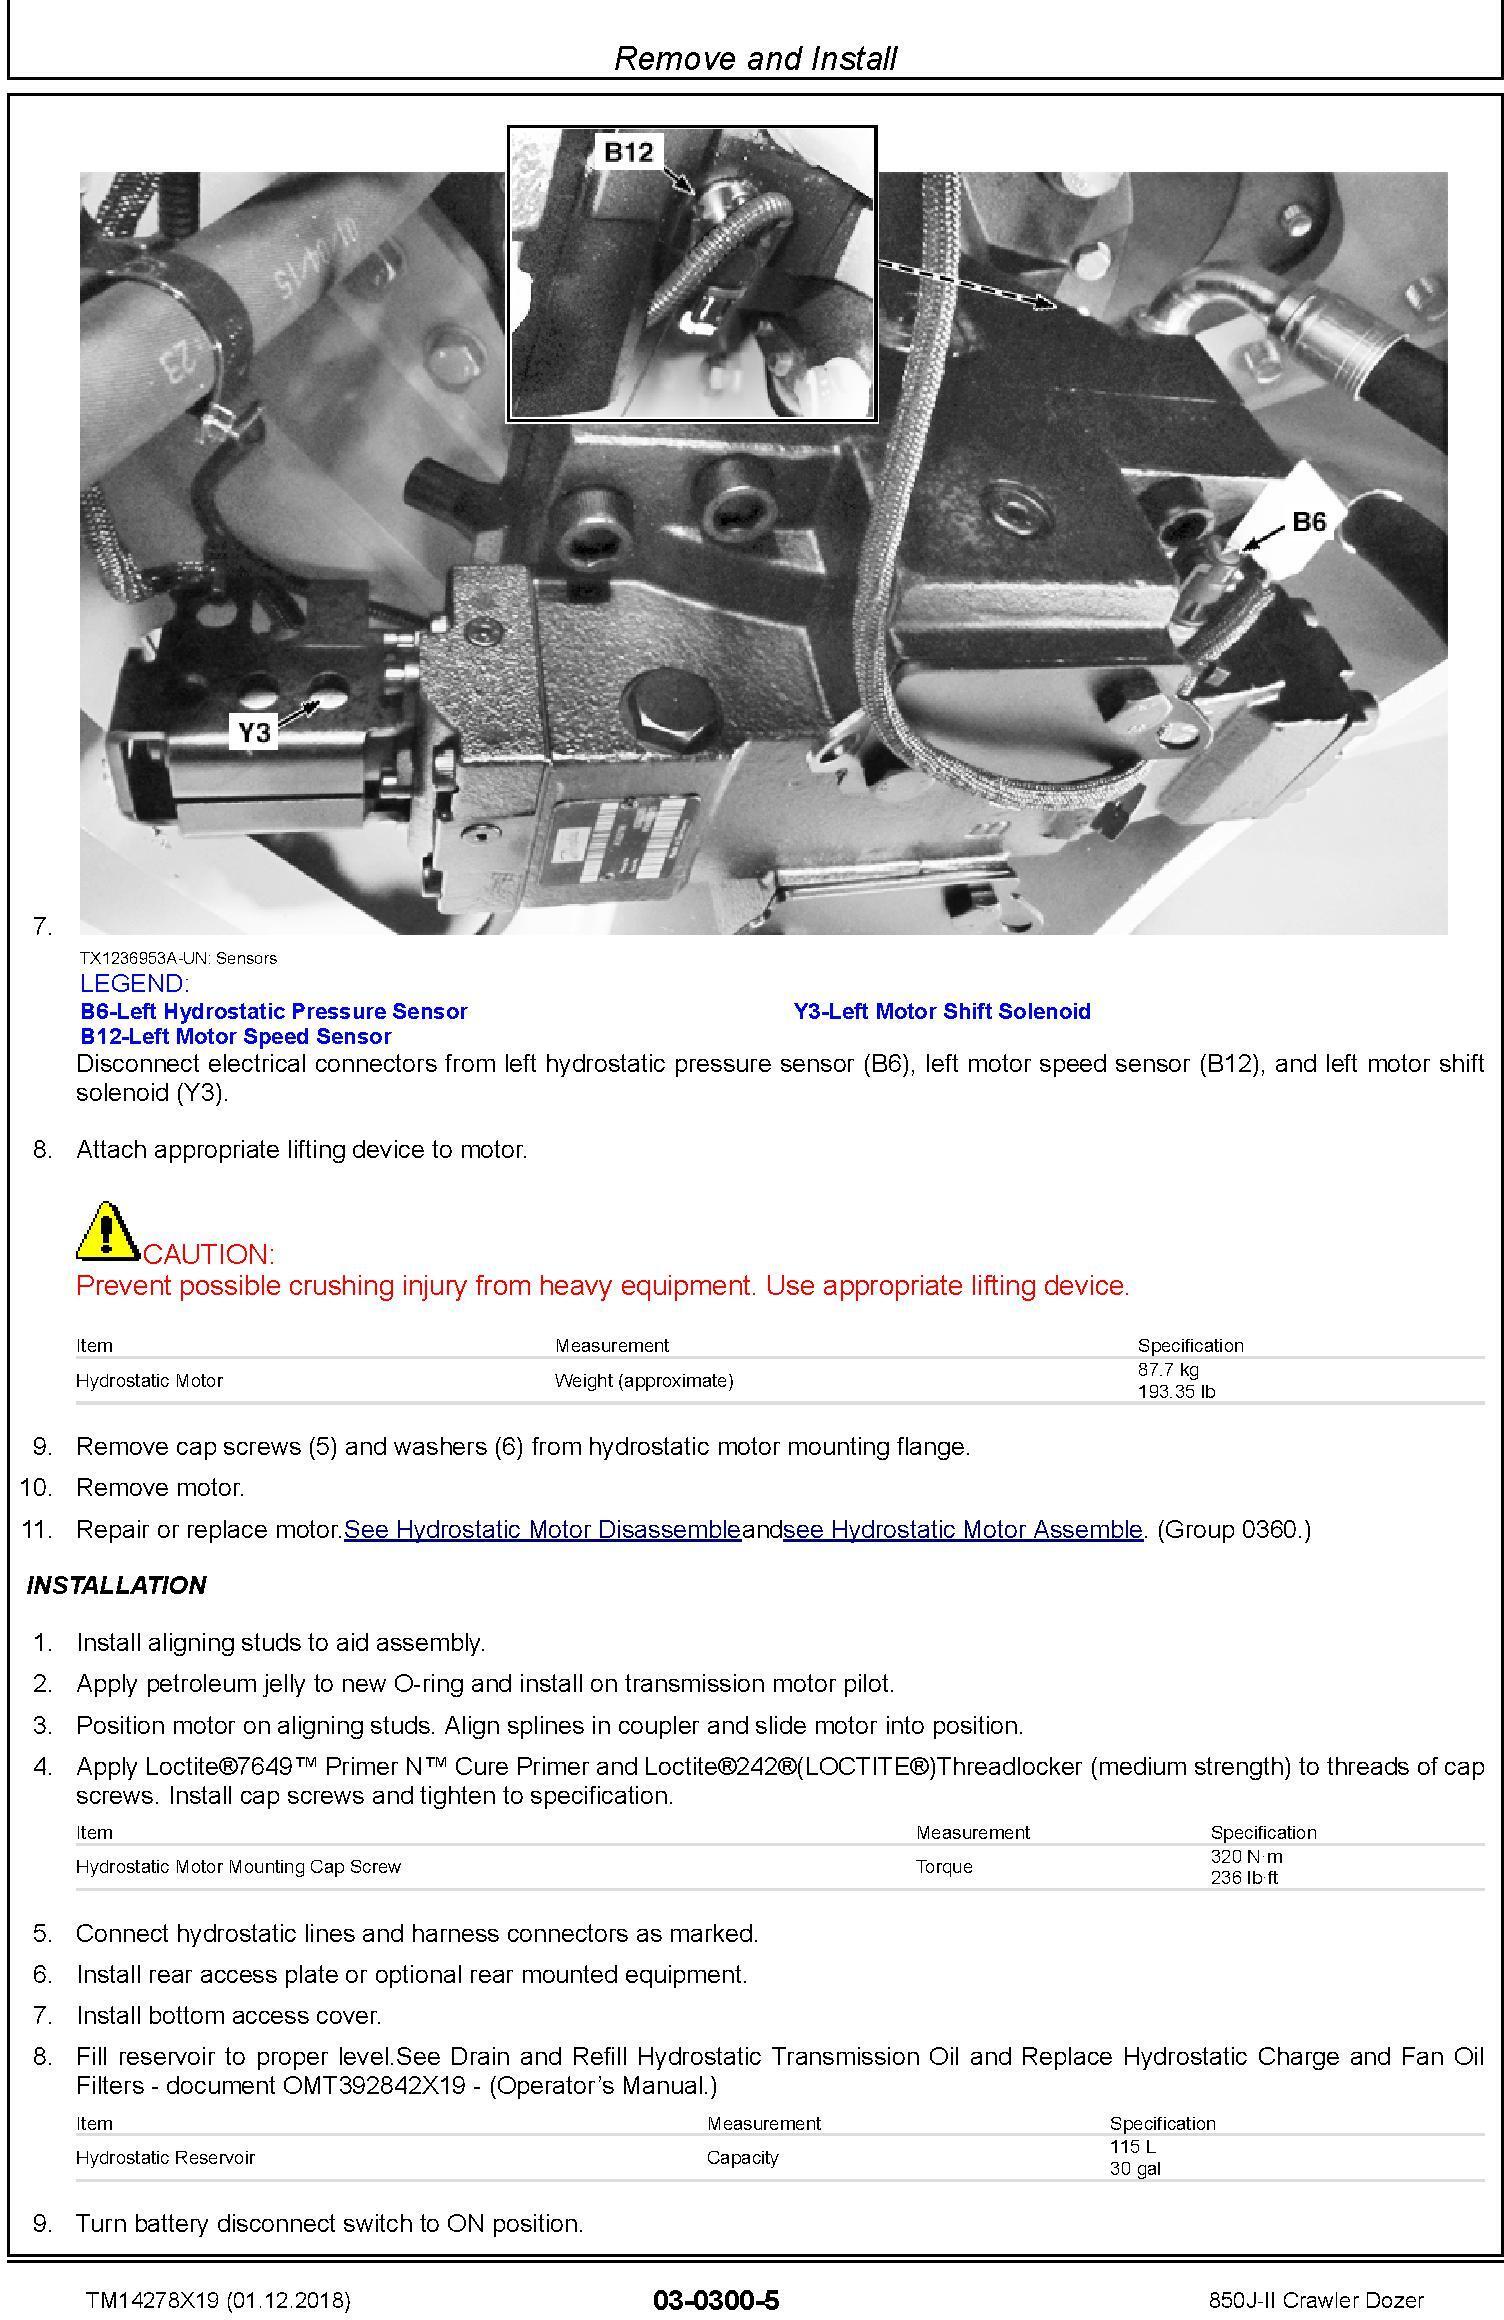 John Deere 850J-II (SN. D000001-) Crawler Dozer Repair Service Manual (TM14278X19) - 3